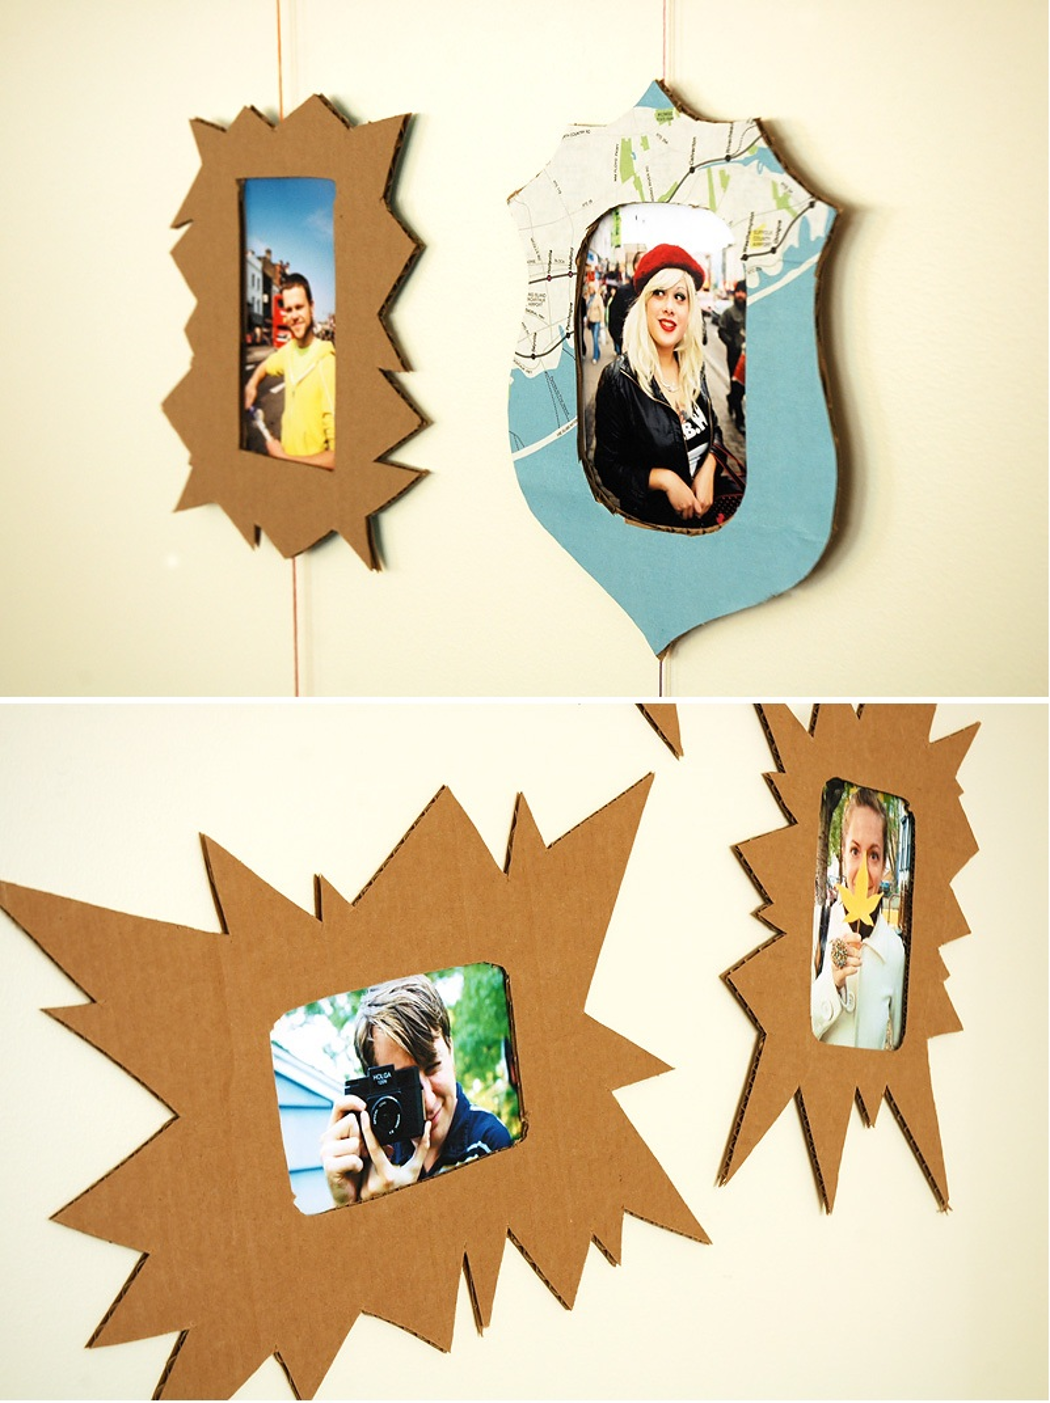 DIY Tutorial Cardboard / DIY Cardboard Picture Frames | Diy mit ...